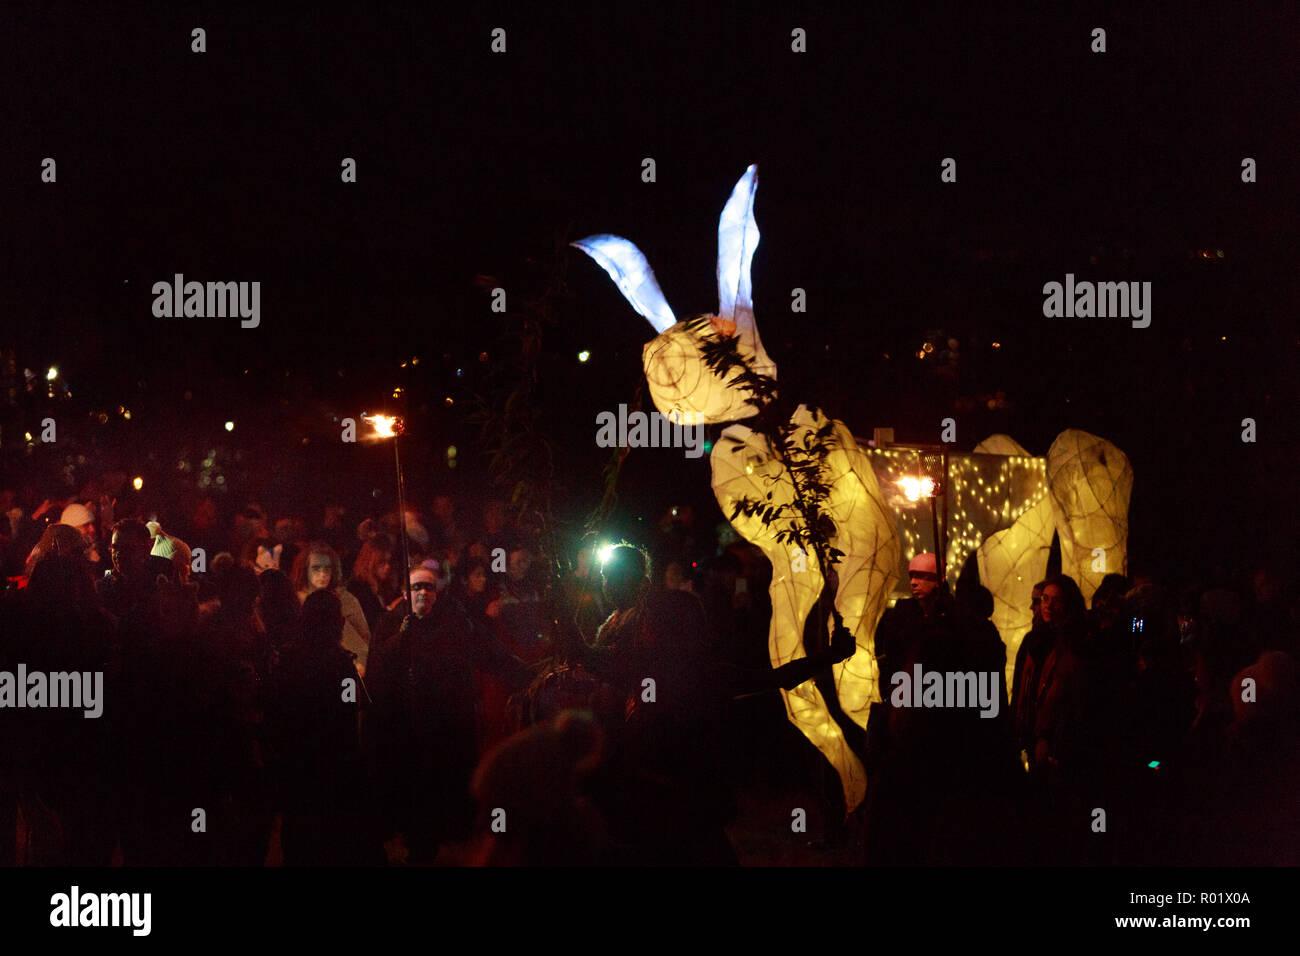 Edinburgh, Scotland. UK. 31 October 2018. The Samhuinn Fire Festival, end of summer start winter. For the first time ever Samhuinn Fire Festival marks the turn of the seasons at the top of Calton Hill. Pako Mera/Alamy Live News Stock Photo